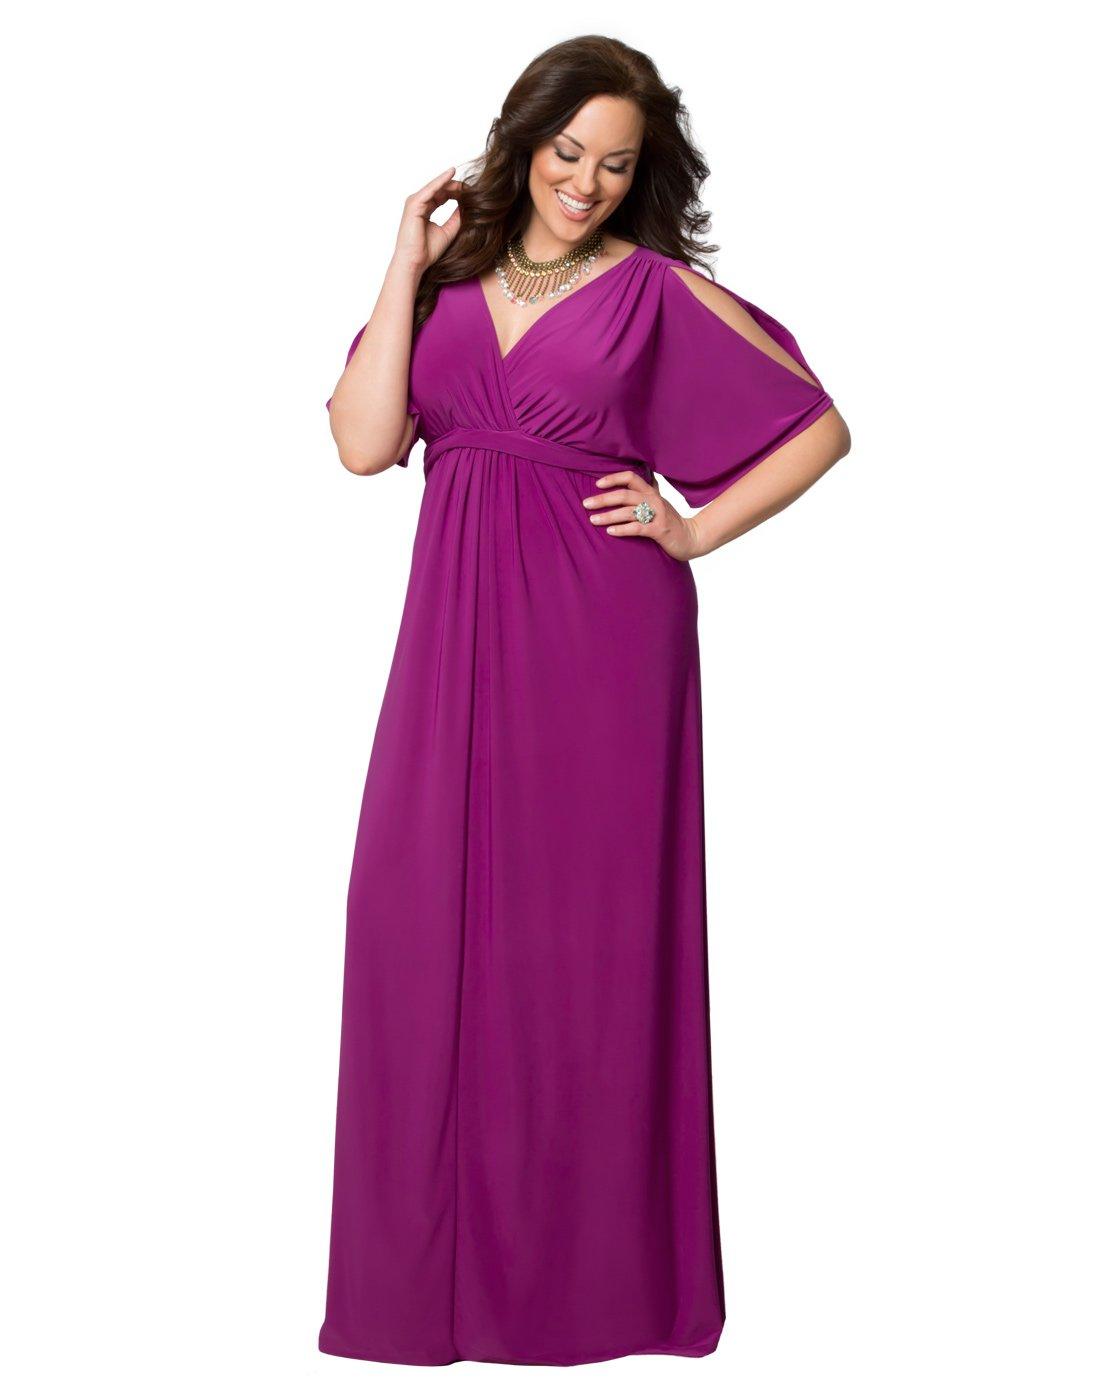 Kiyonna Women's Plus Size Coastal Cold Shoulder Dress 2X Orchid